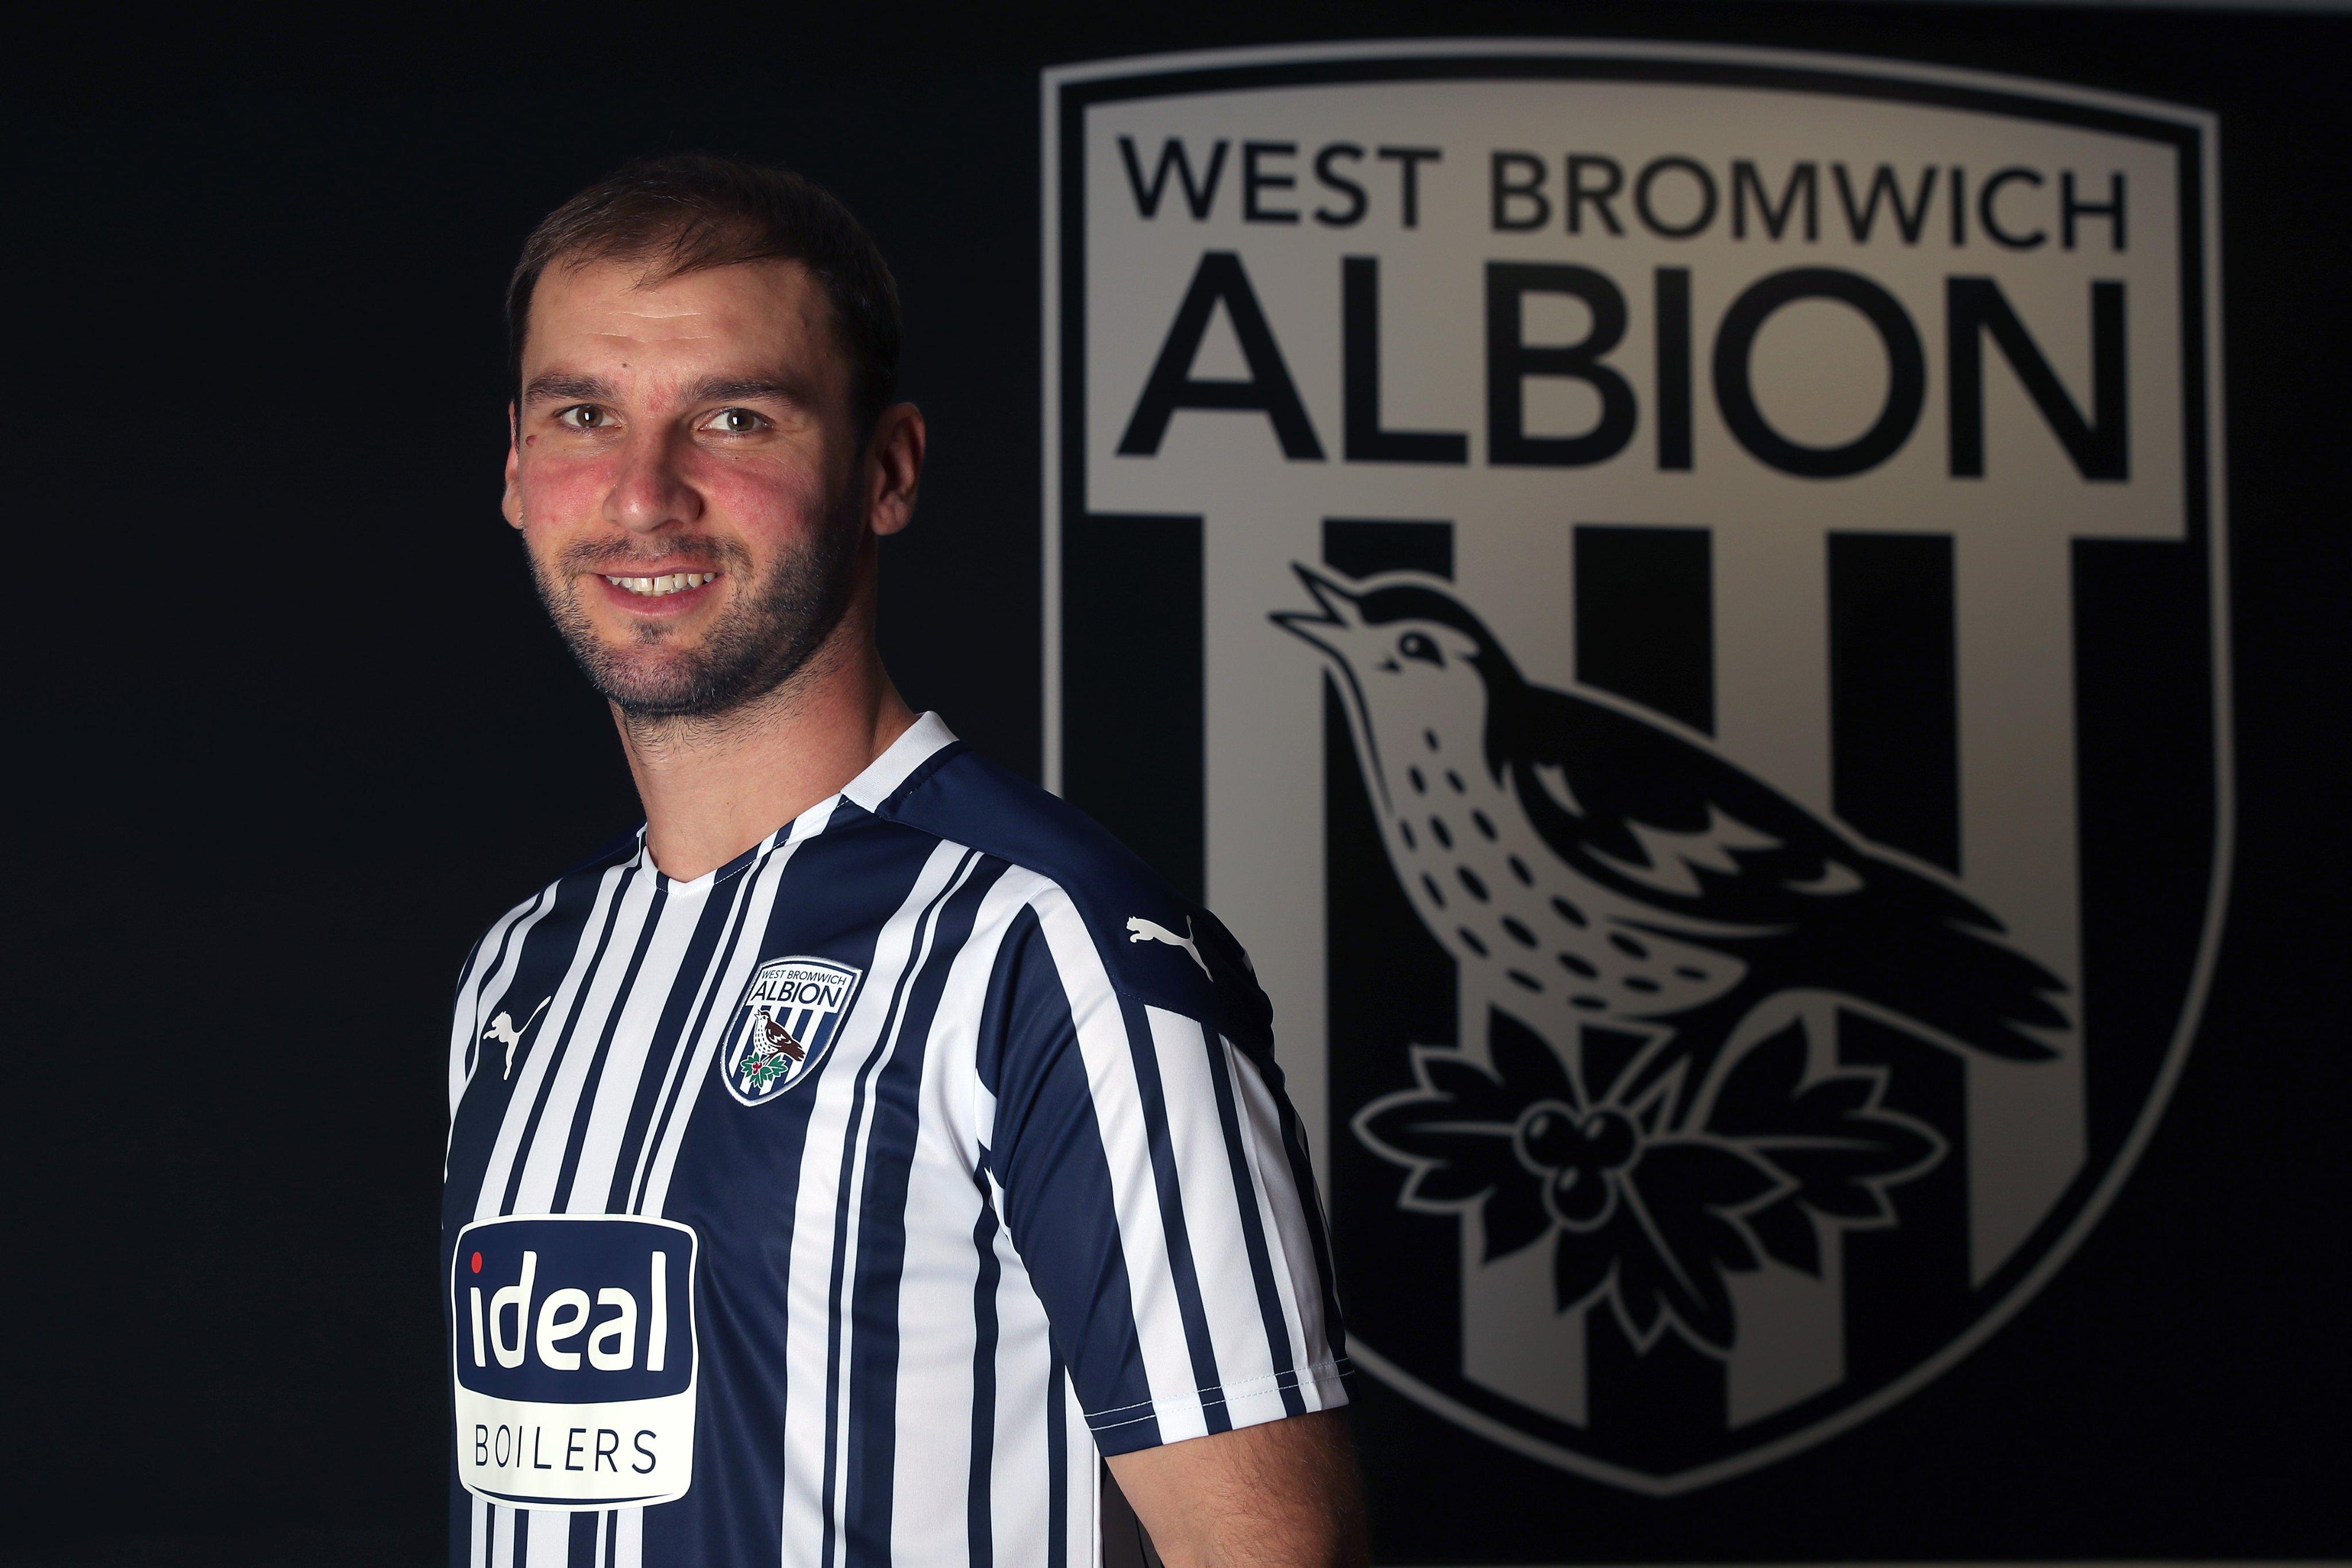 West Brom sign Premier League winner to bolster top flight ...